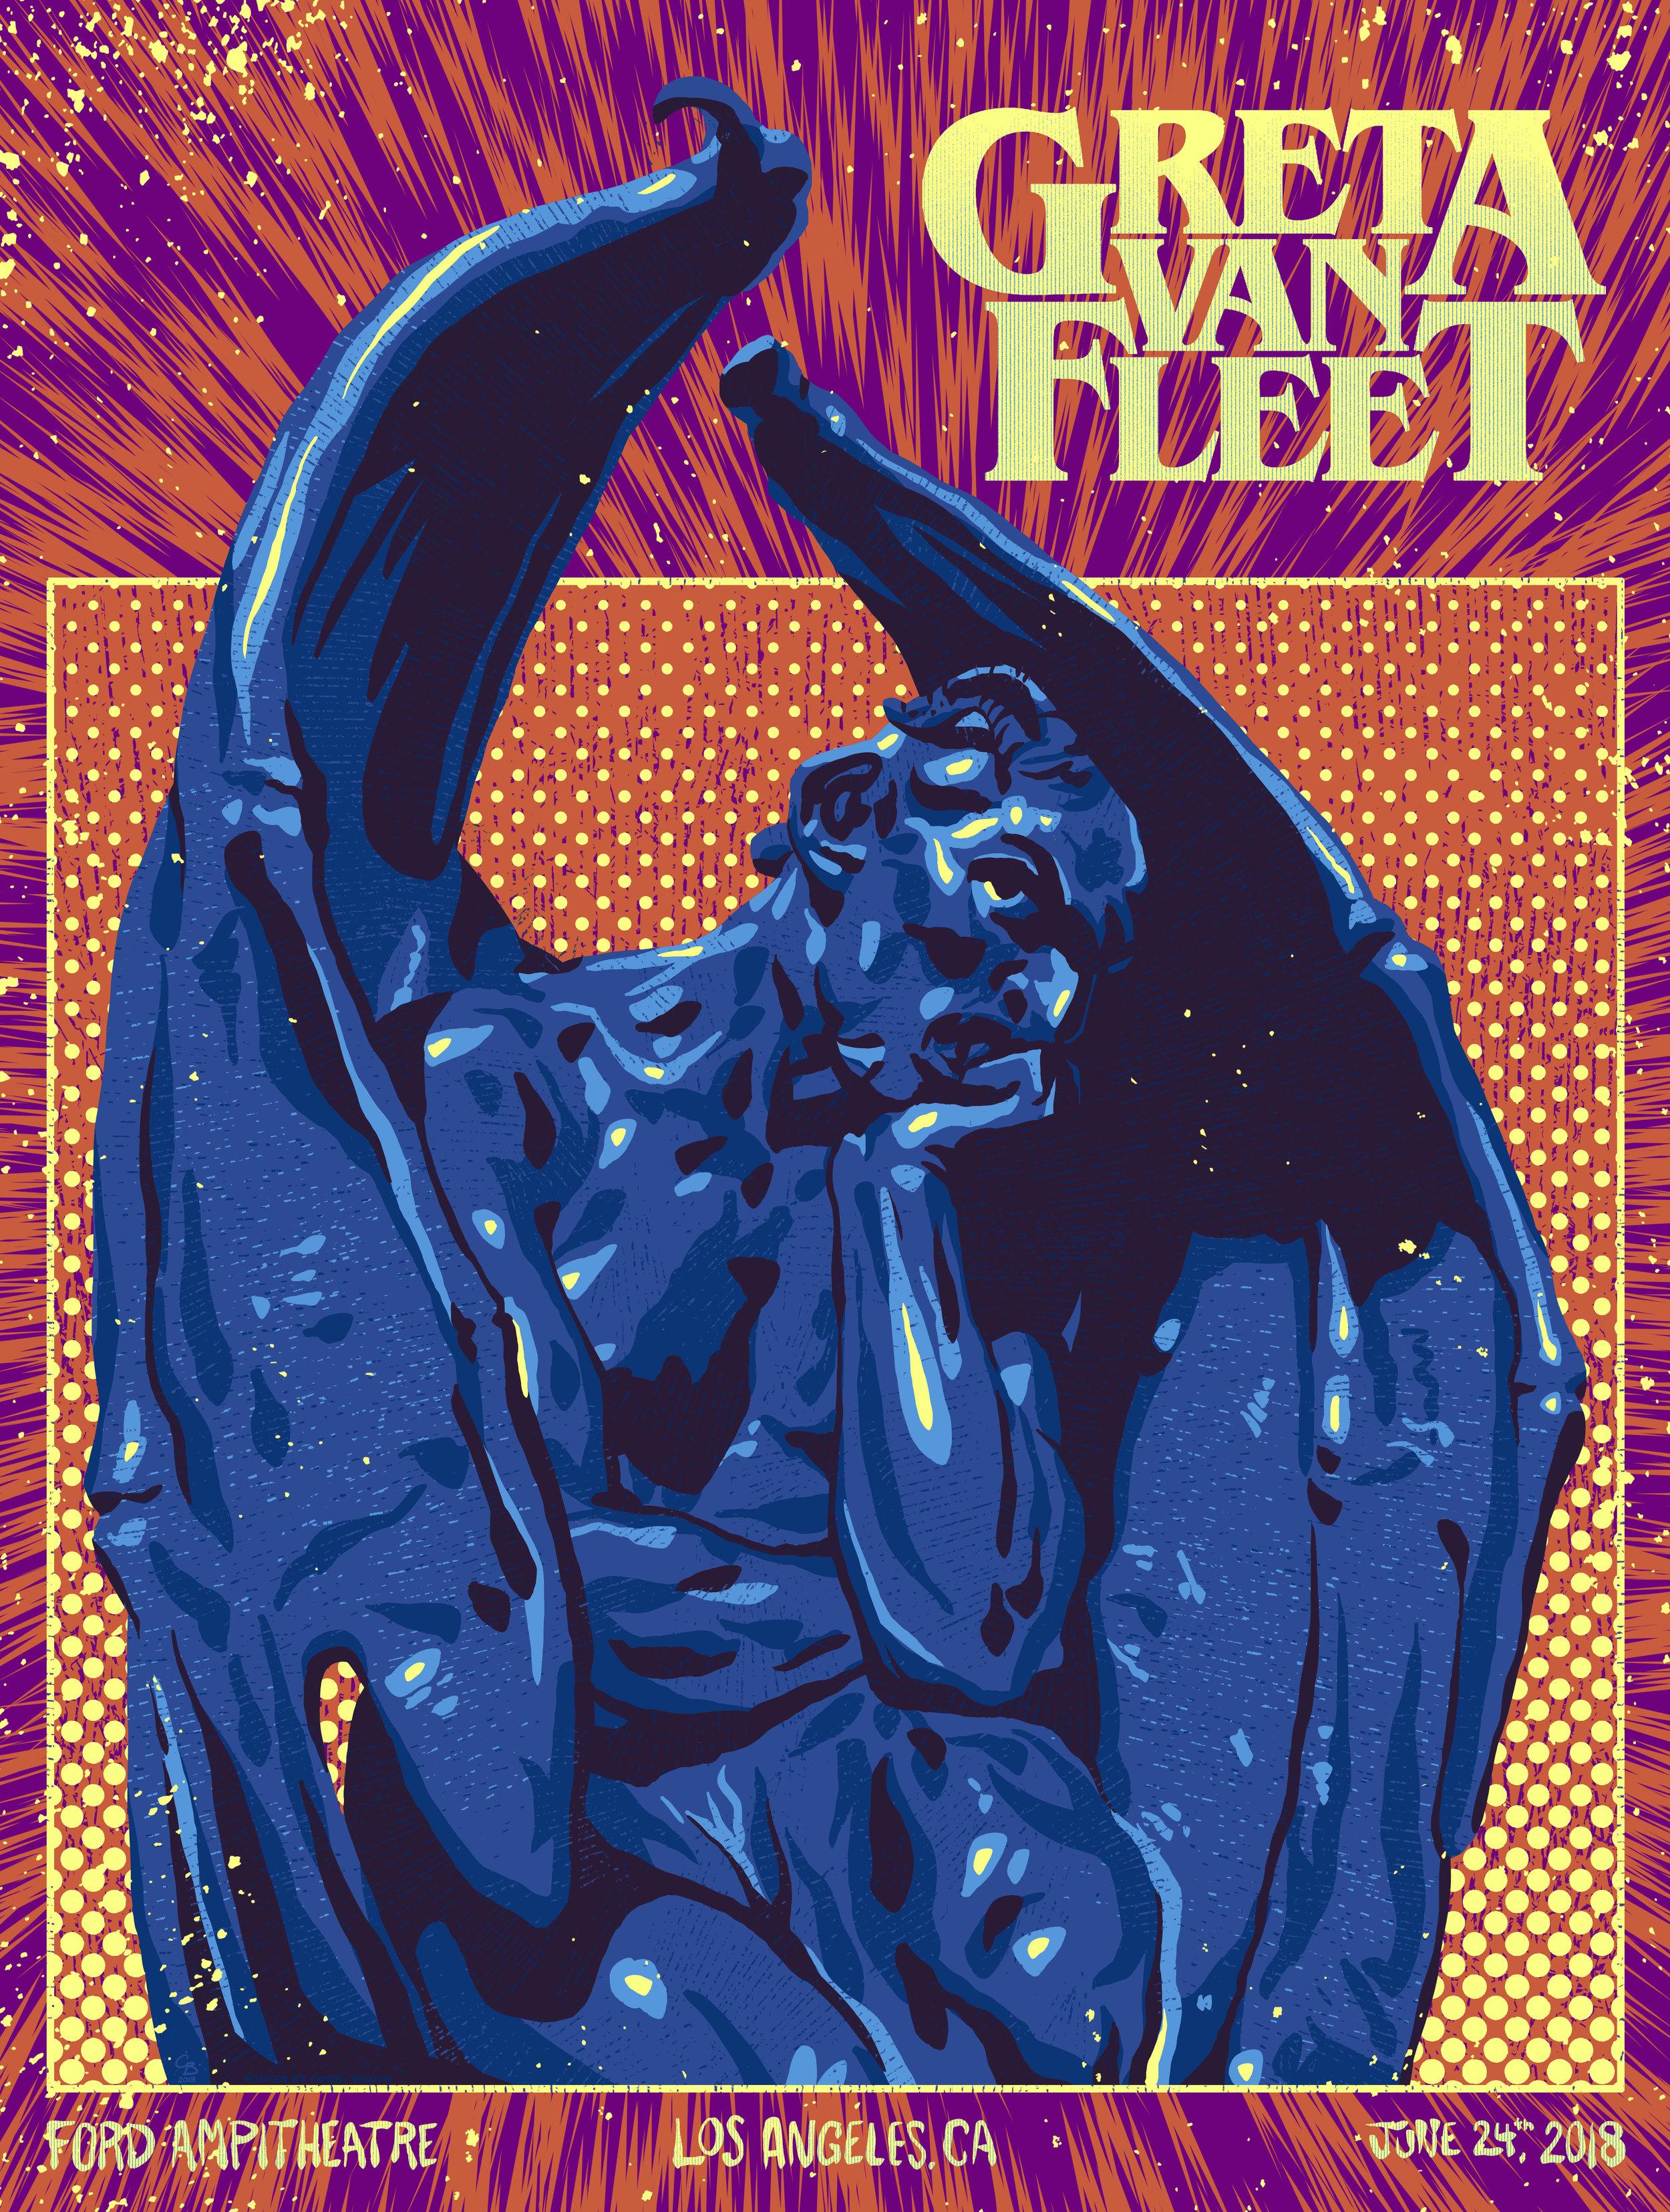 Greta Van Fleet - Feeling Blue Variant